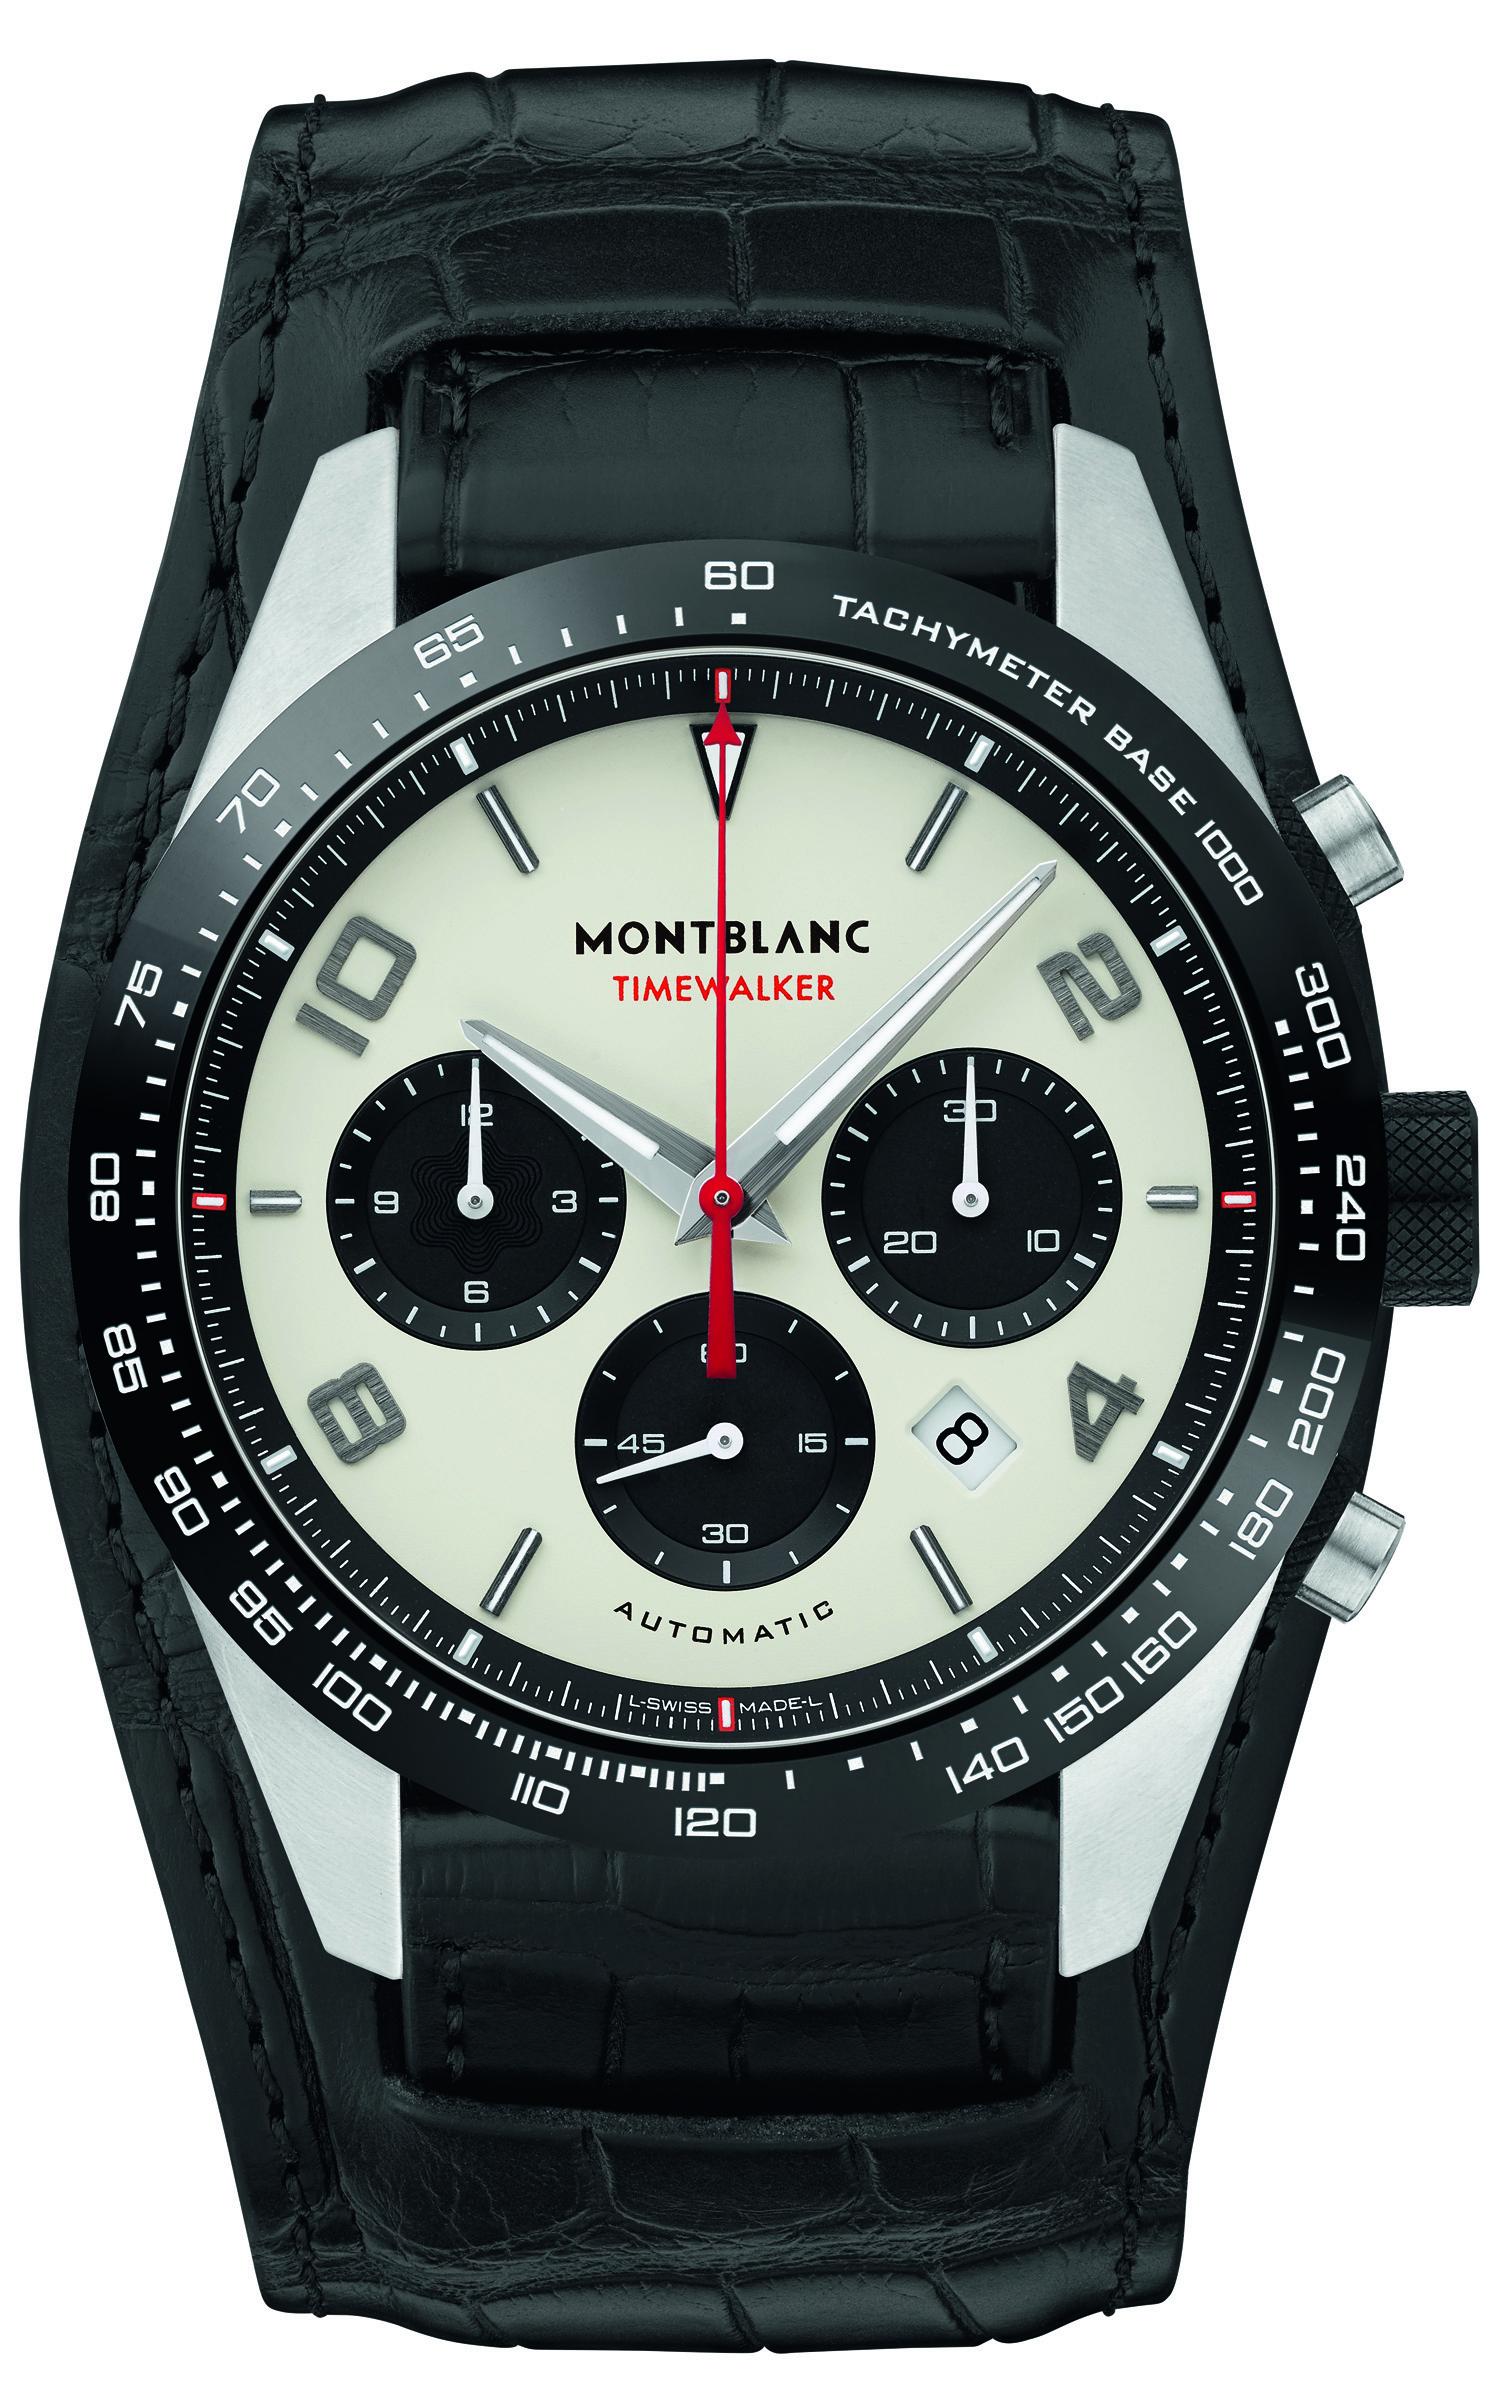 Montblanc TimeWalker Manufacture Chronograph